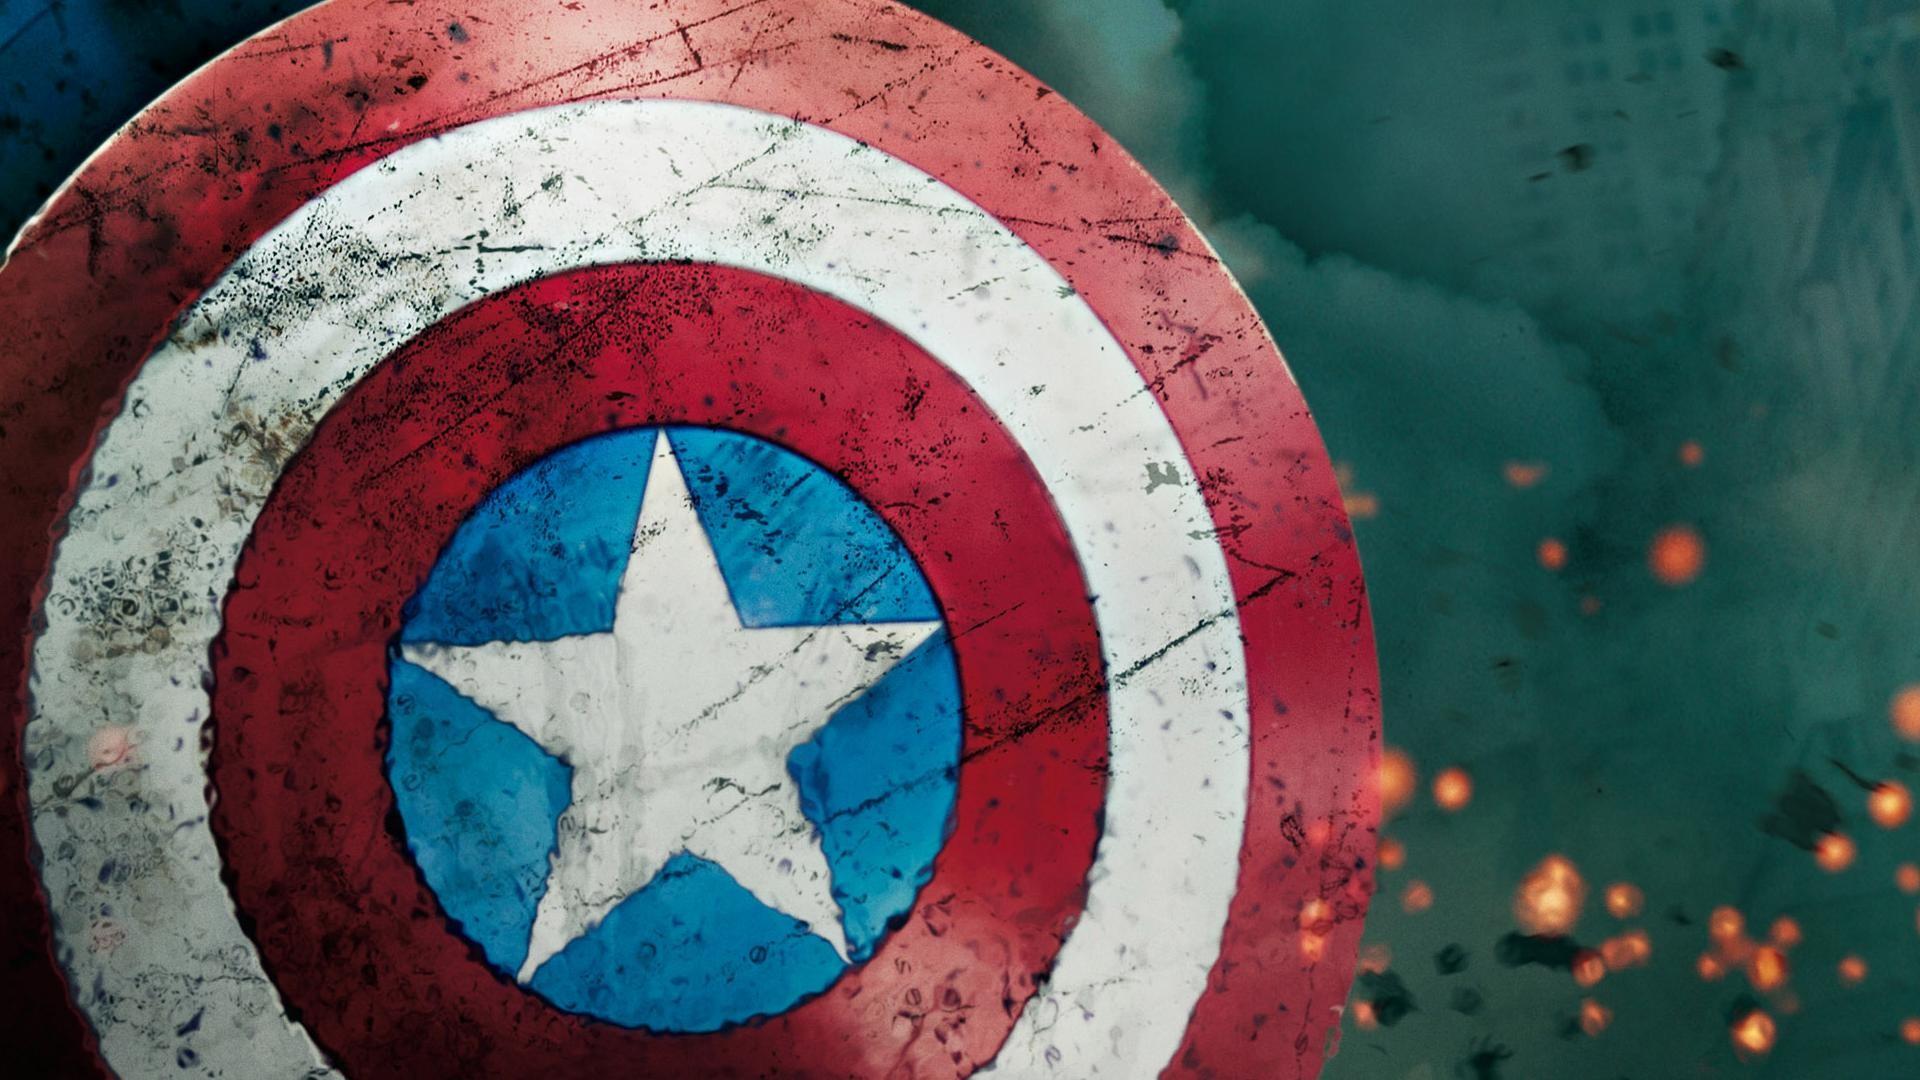 wallpaper.wiki-Free-desktop-images-captain-americas-shield-